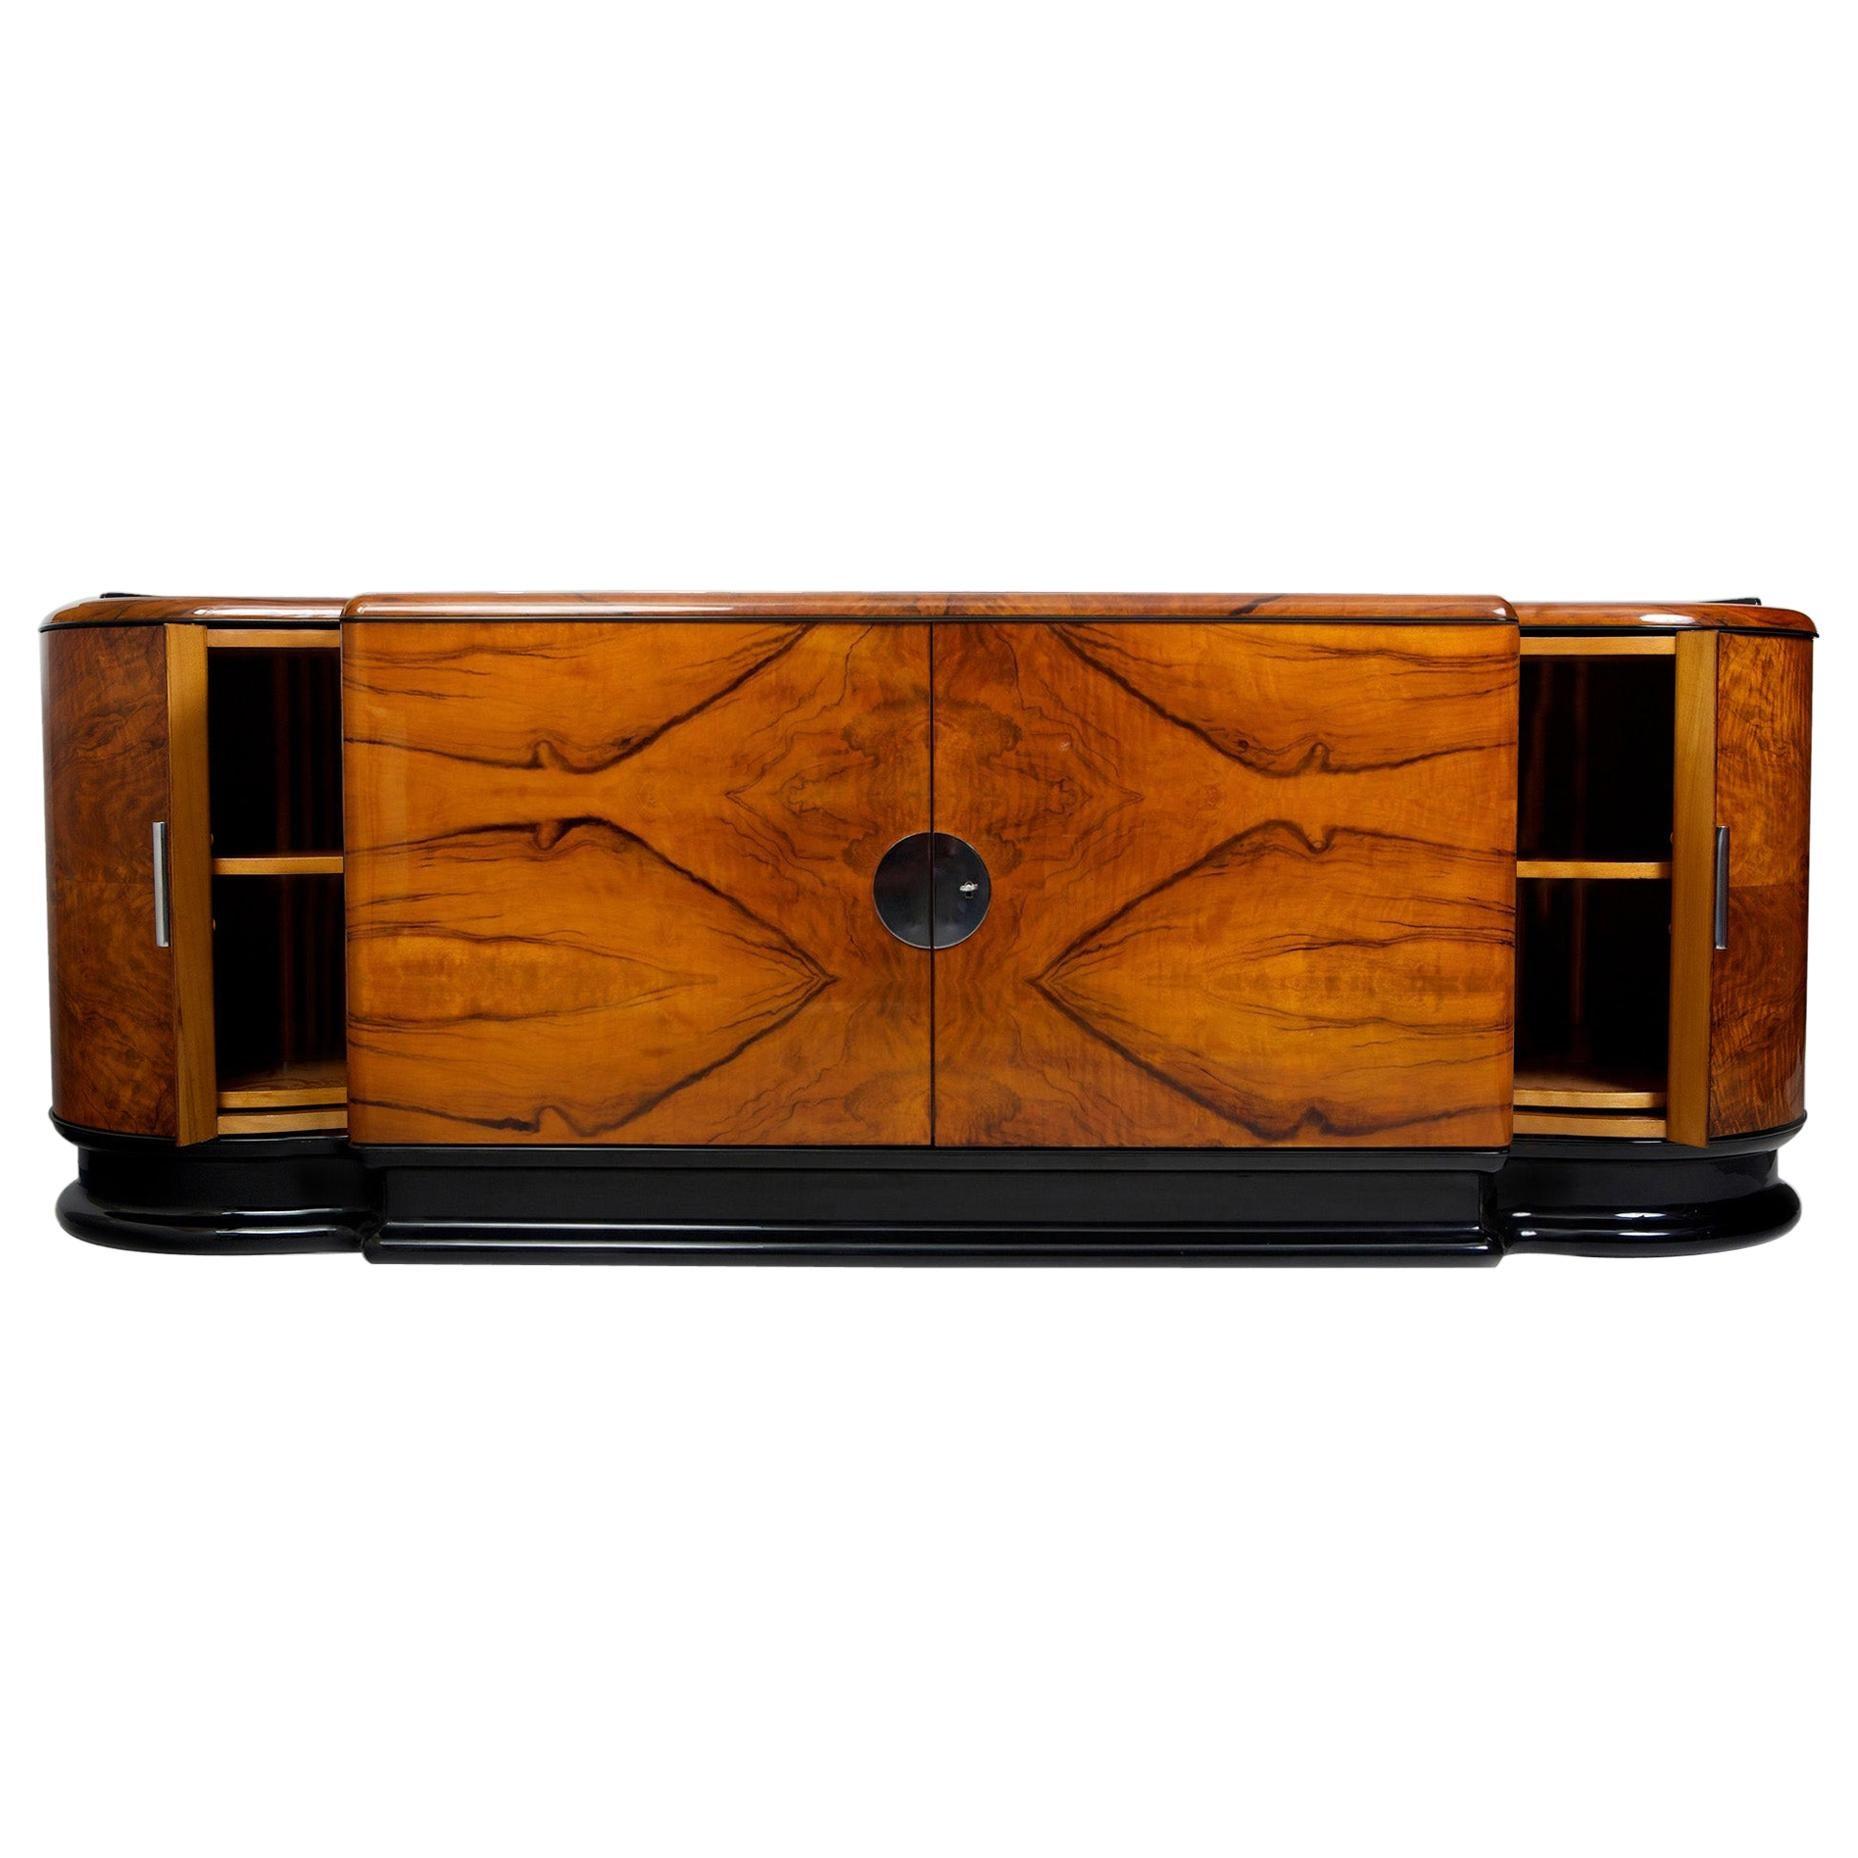 Unique Czech Walnut Art Deco Saloon Sideboard by Jindrich Halabala, UP Zavody